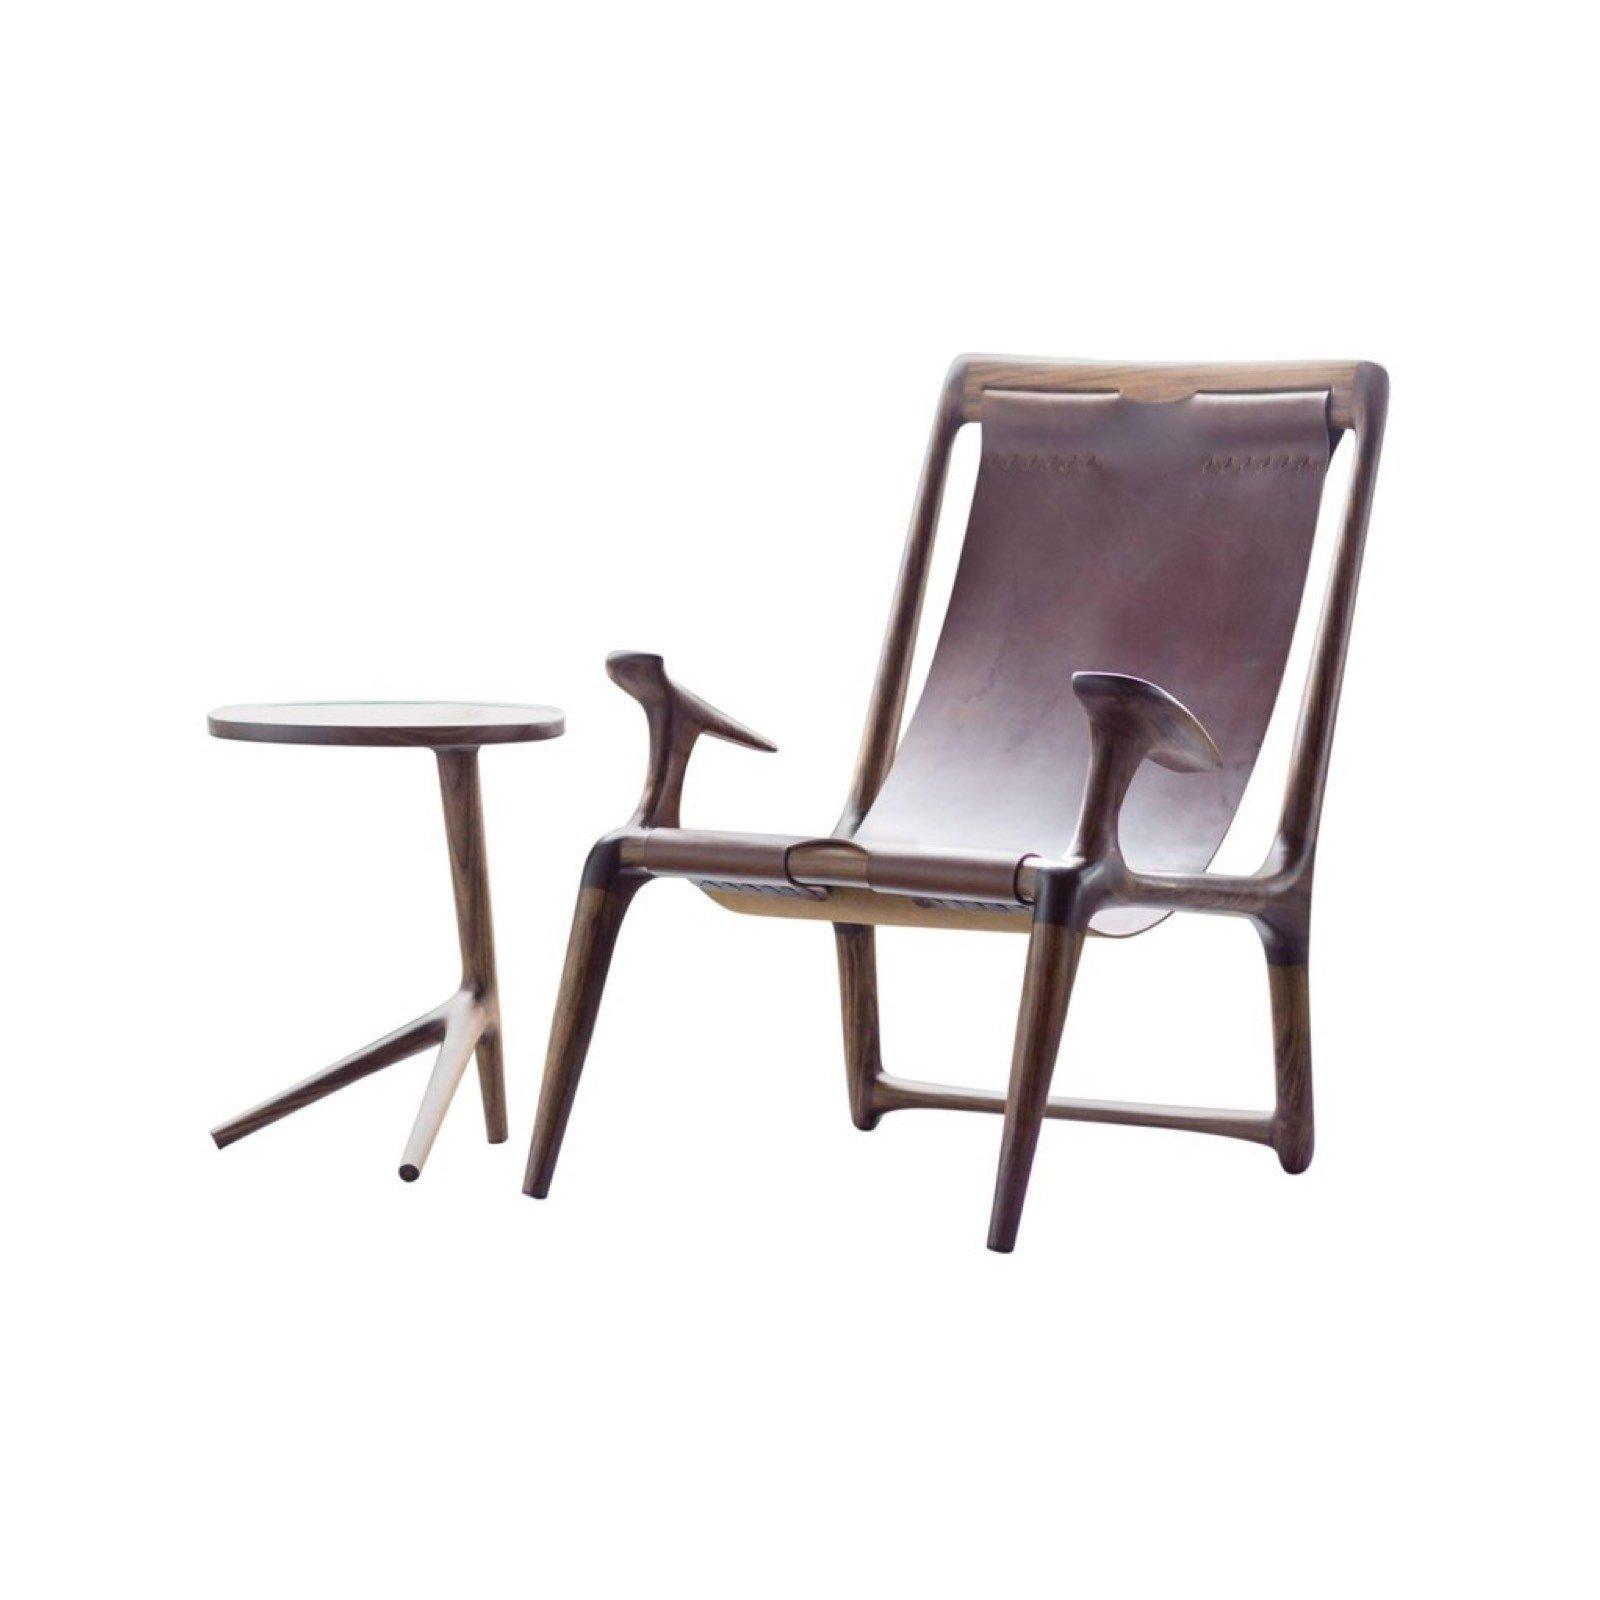 Fernweh Woodworking Walnut Leather Sling Chair By Fernweh